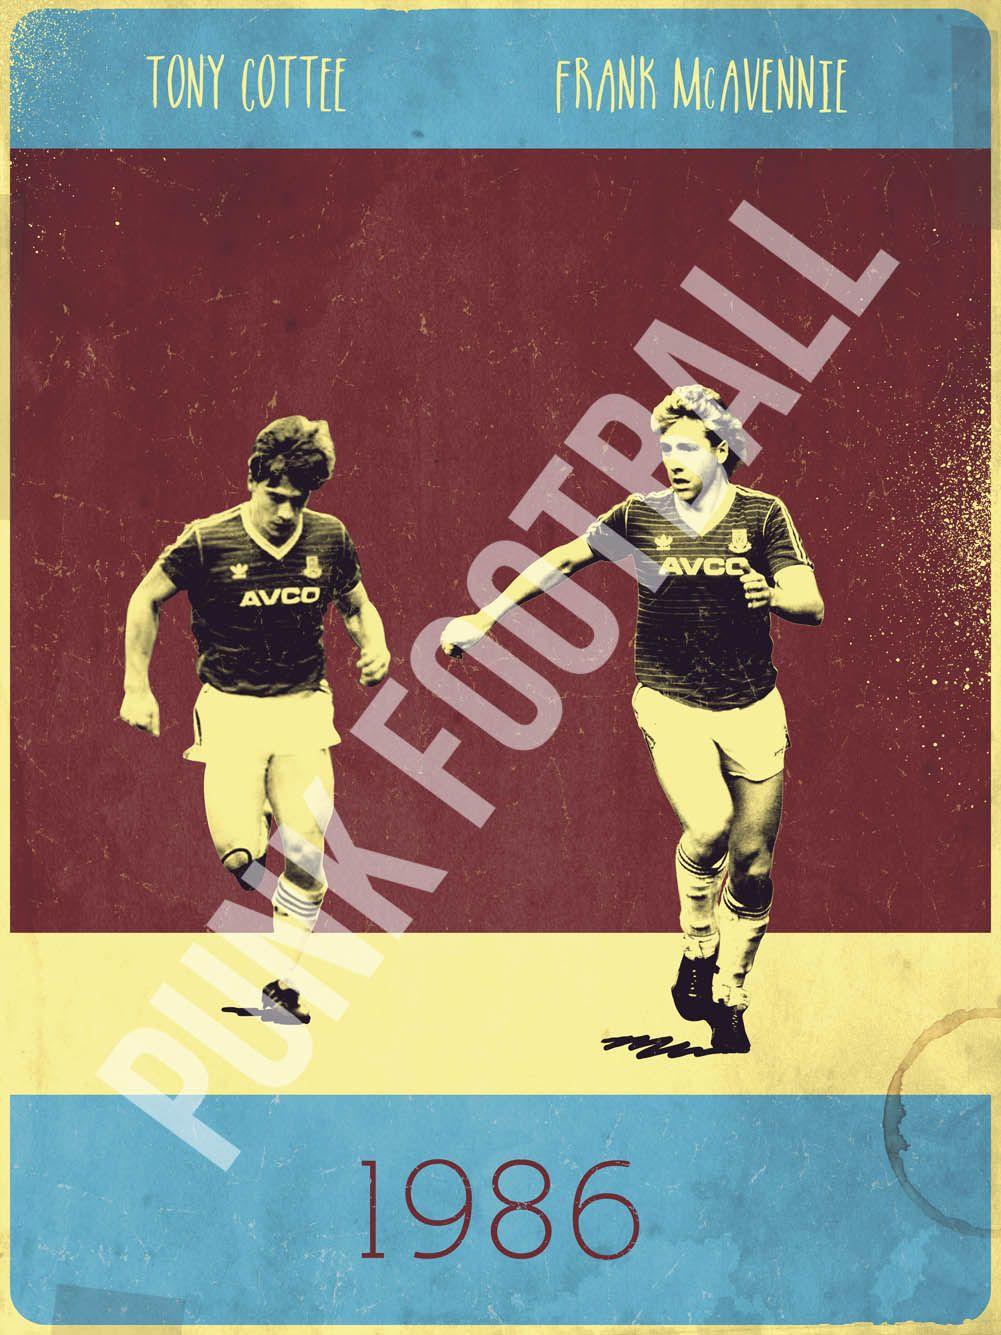 Frank McAvennie & Tony Cottee Vintage Poster (West Ham United)